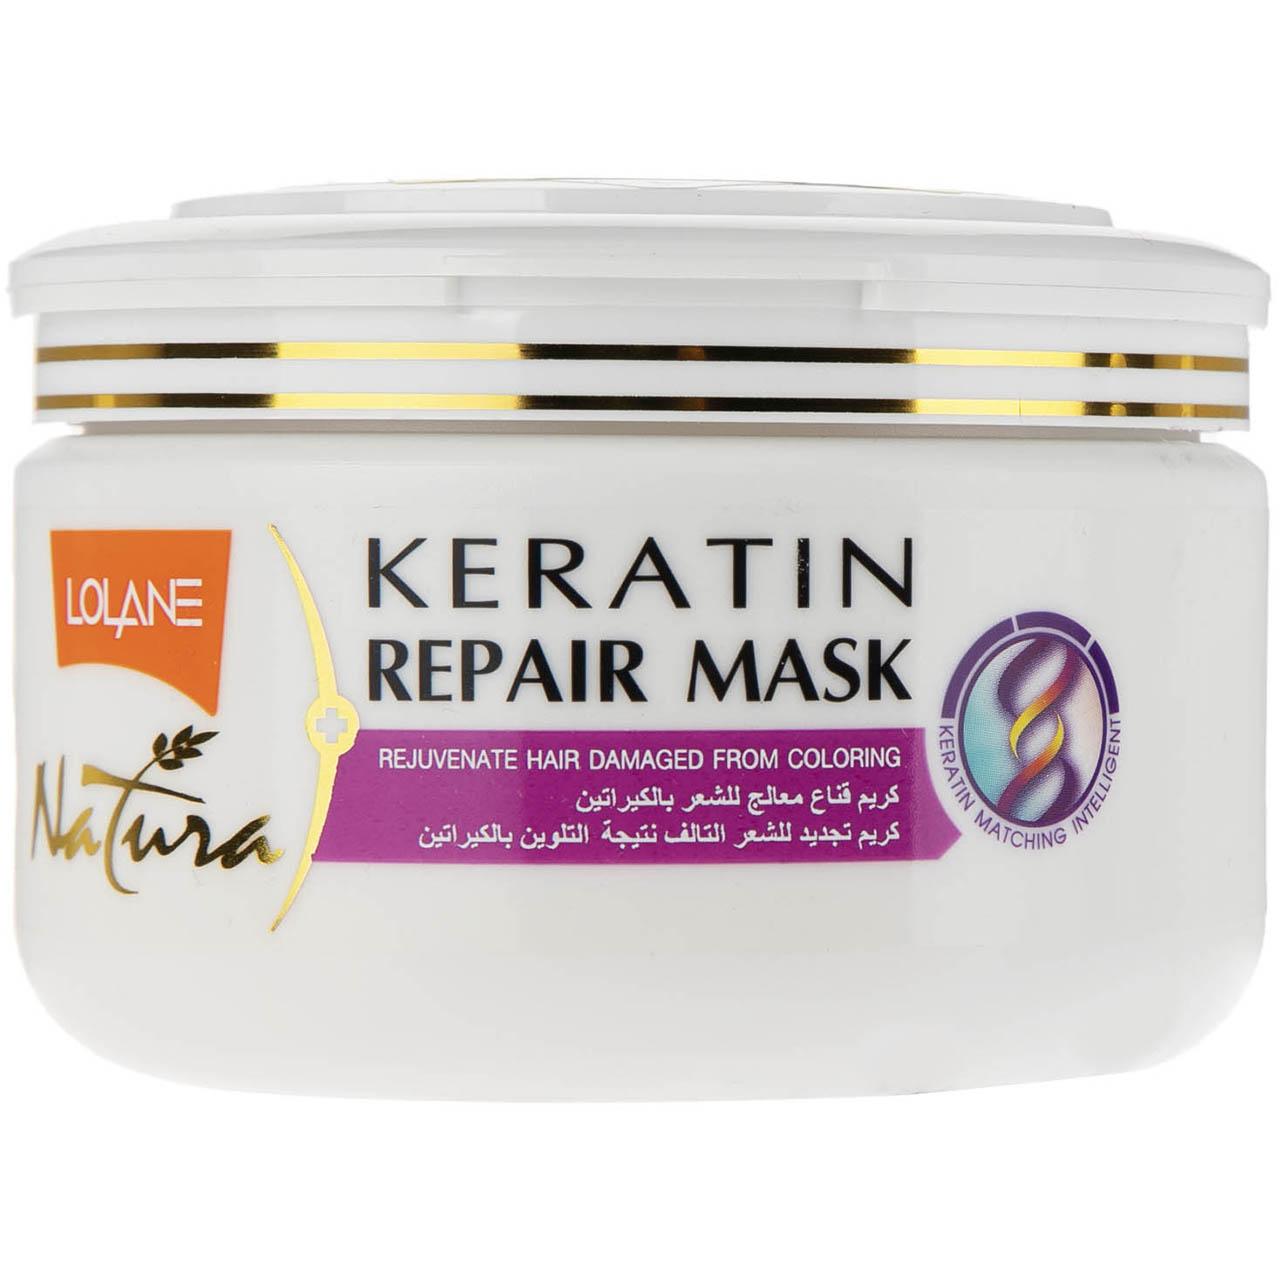 قیمت ماسک موی لولان مدل Keratin حجم 200 میلی لیتر